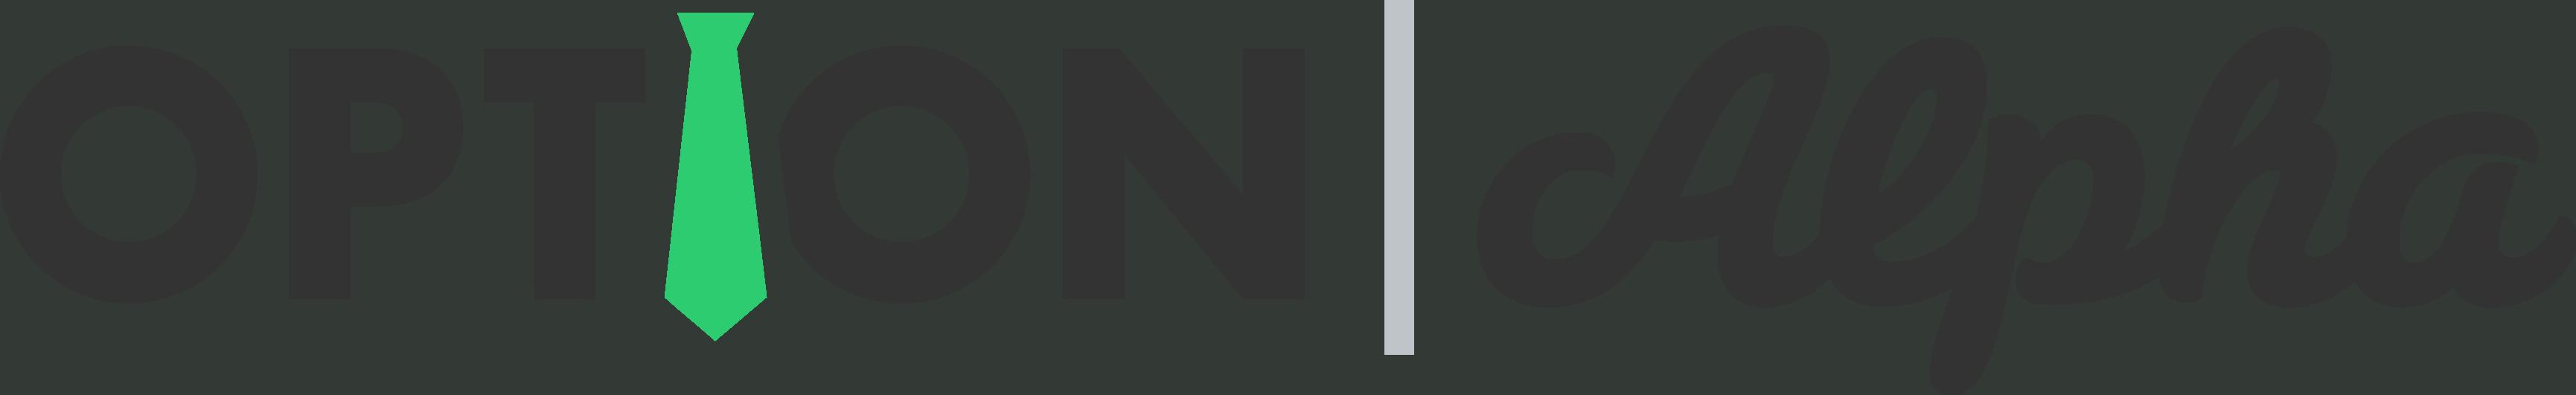 optionalpha-logo